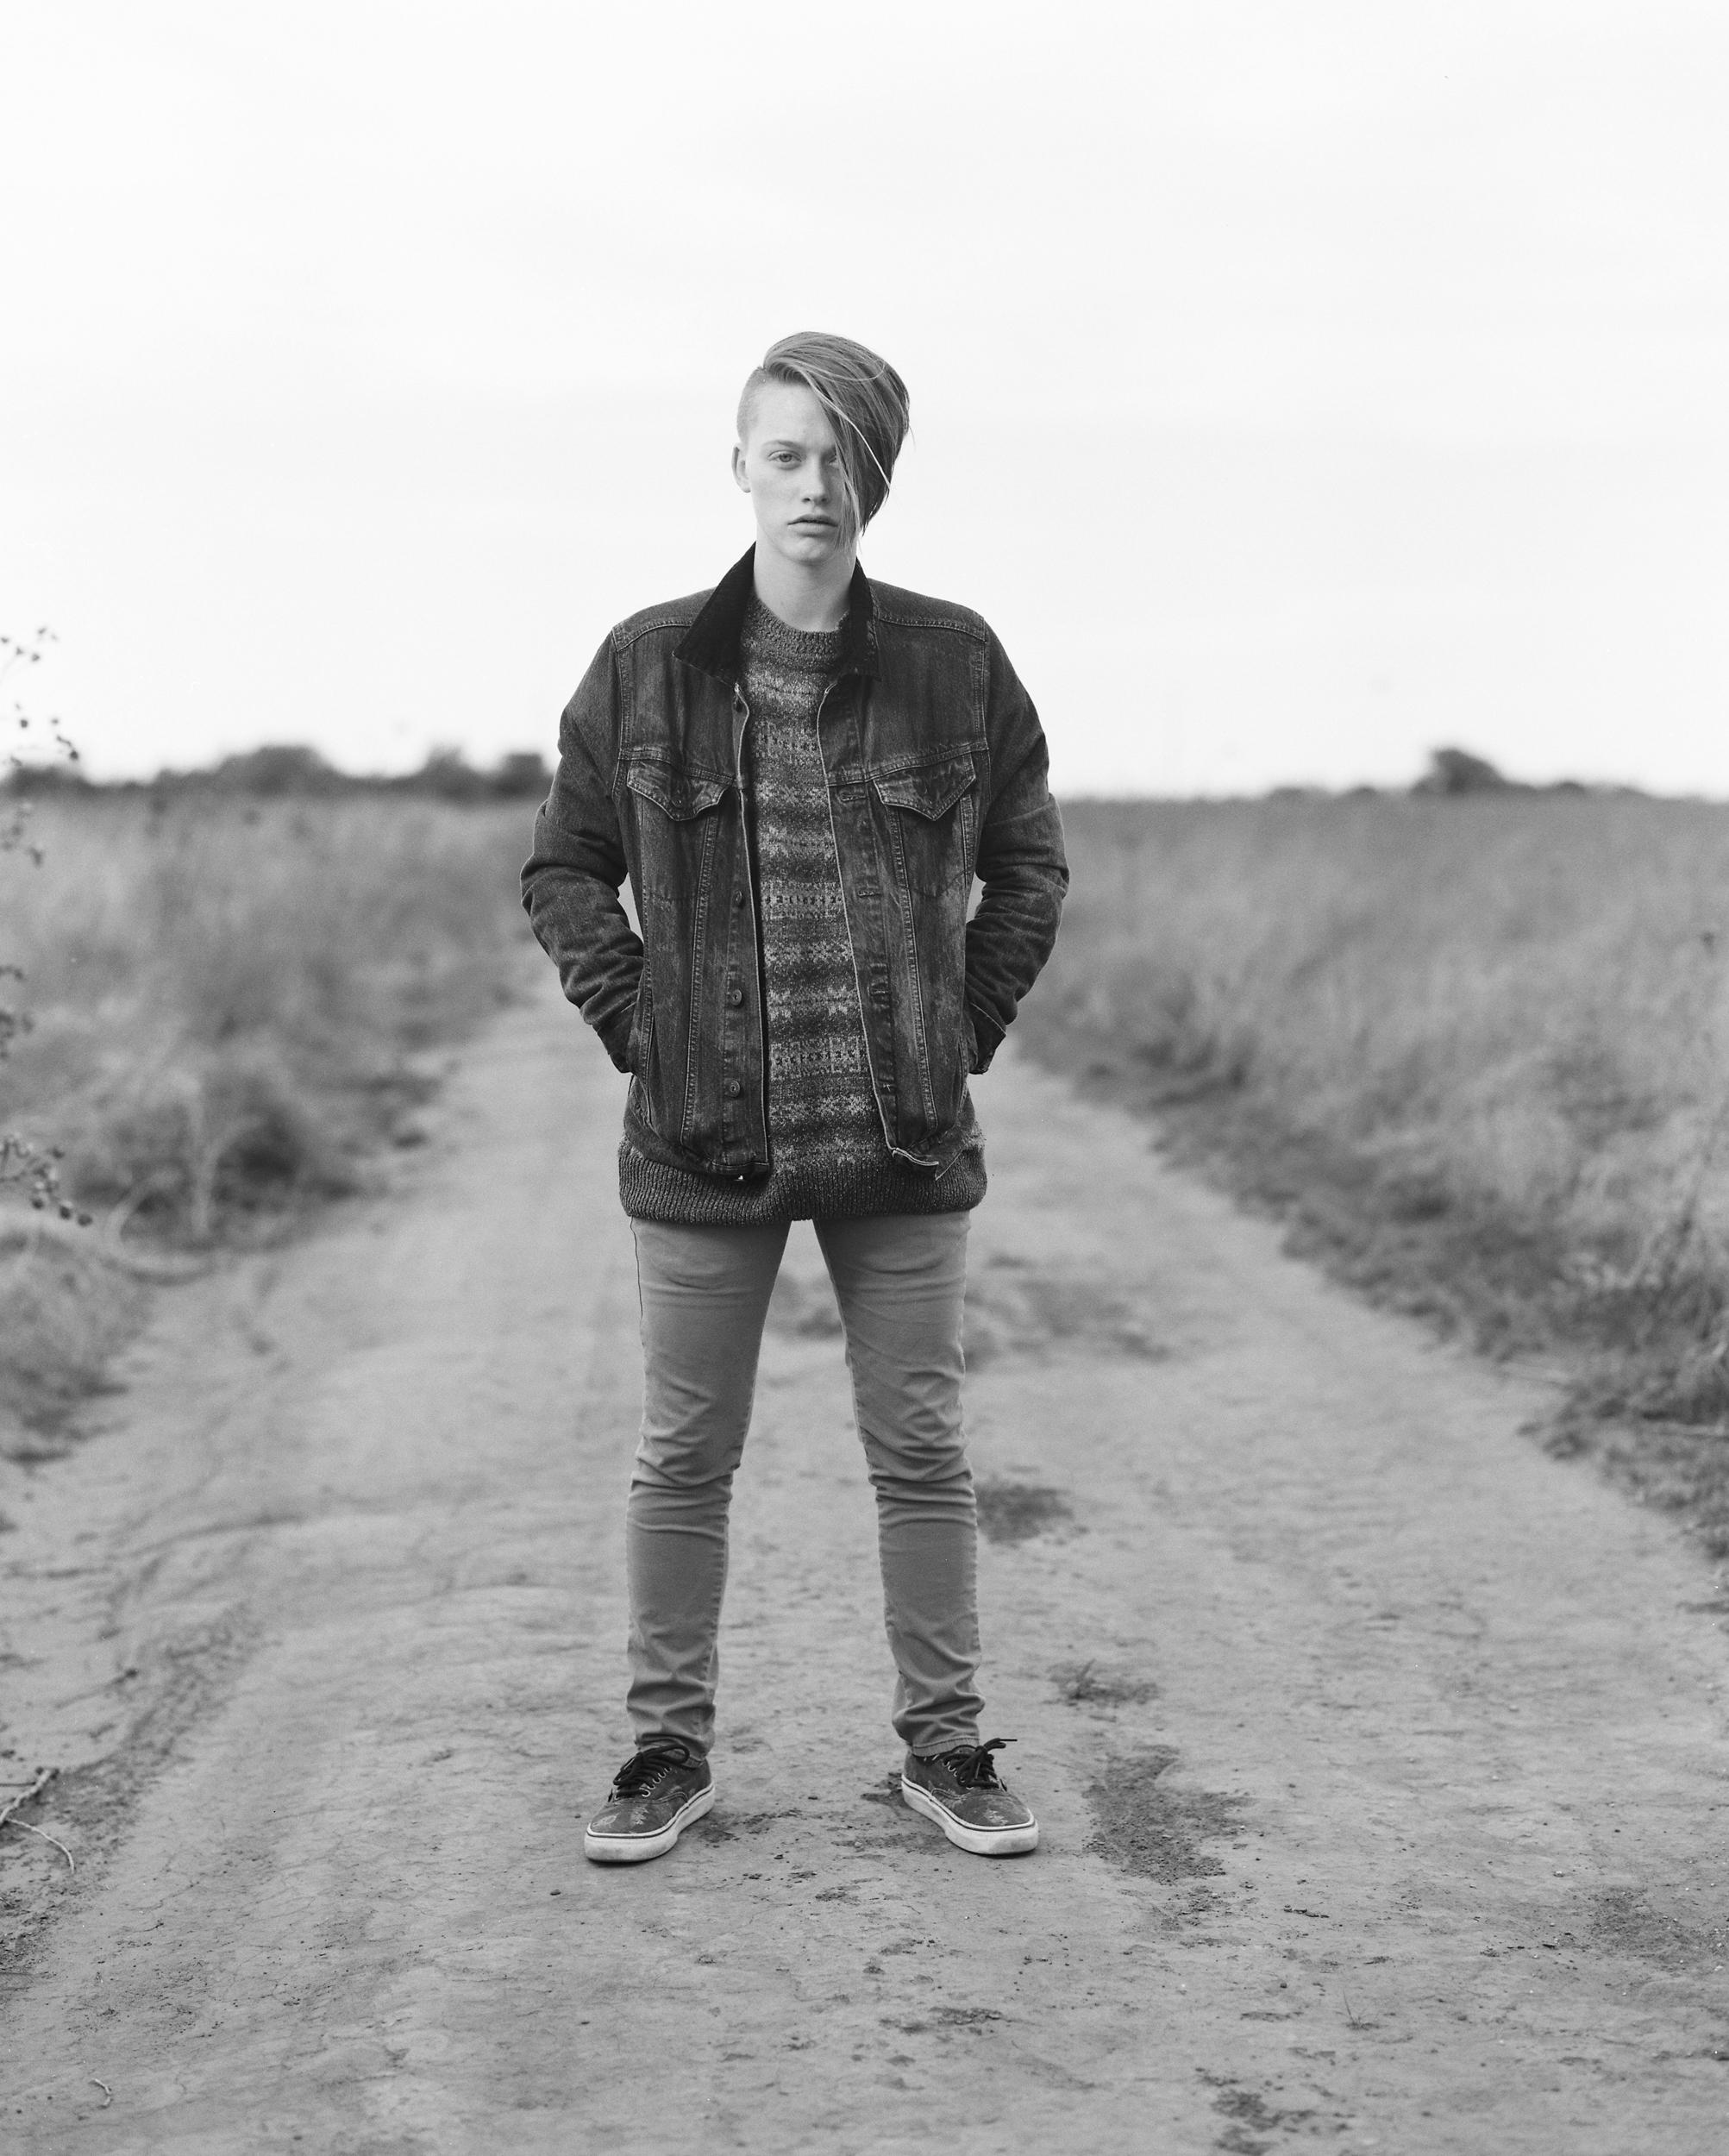 denim-jacket-vans-dirt-road-standing-pose